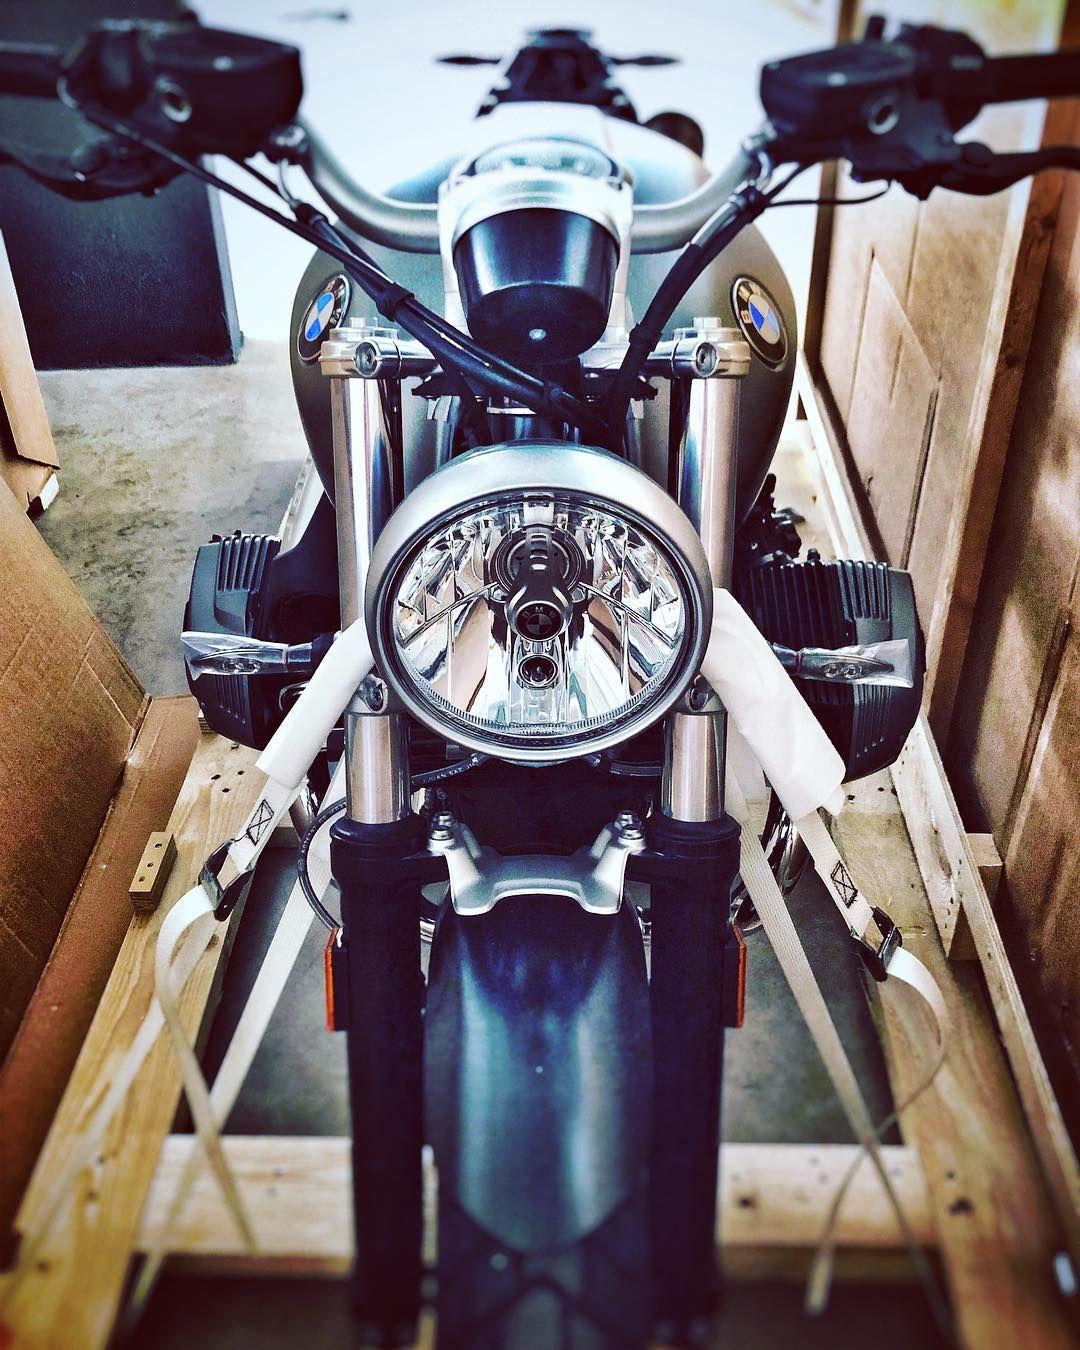 Unboxing R Ninet Scrambler Bmw Bmwmotorcycle Motorrad